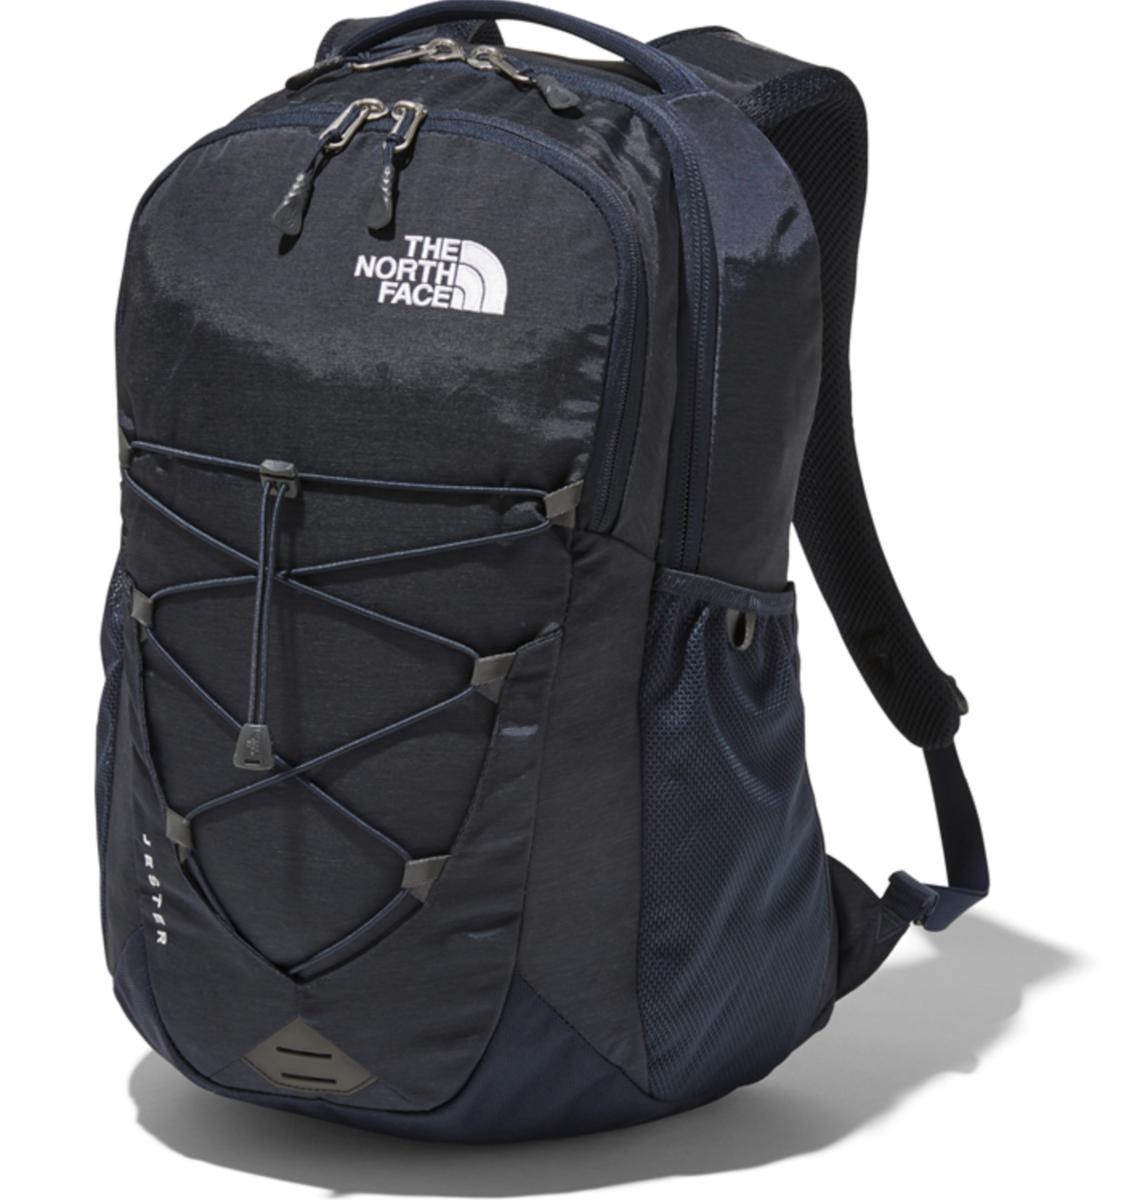 f:id:thebackpack:20191014111500p:plain